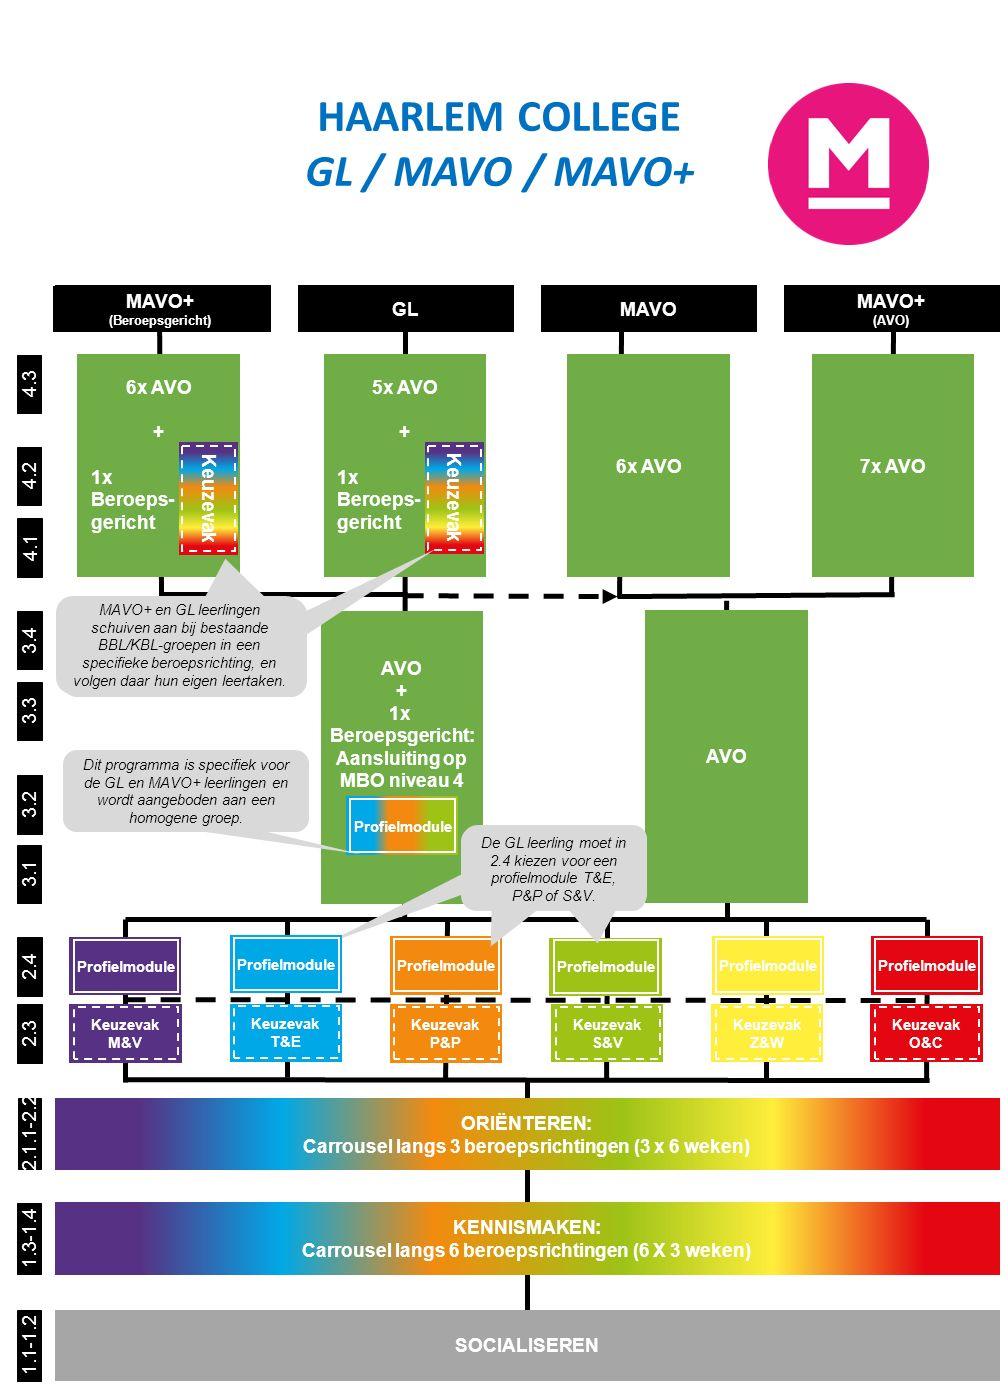 MAVO+ (AVO) MAVOGL 6x AVO + 1x Beroeps- gericht 4.3 4.2 3.4 3.3 3.2 3.1 4.1 HAARLEM COLLEGE GL / MAVO / MAVO+ AVO + 1x Beroepsgericht: Aansluiting op